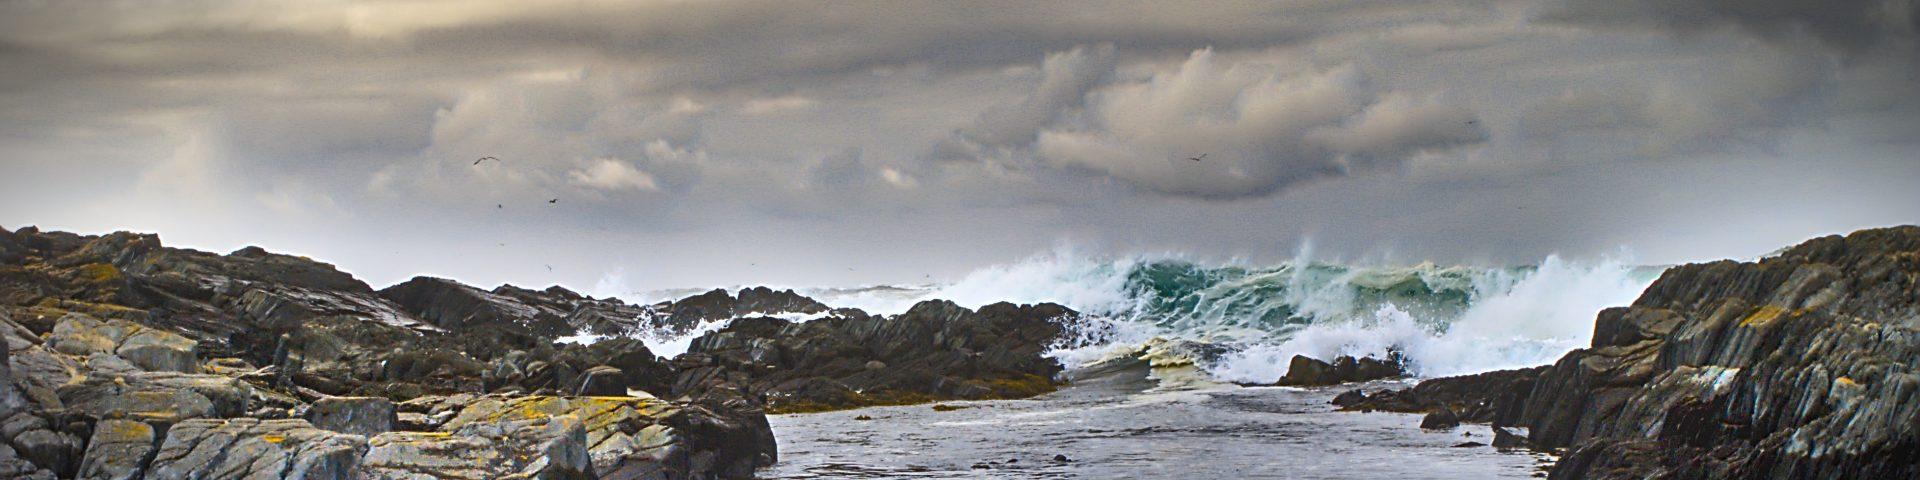 Schlechtwetter Fotografie Berlevåg Norwegen Strand bei Sturm